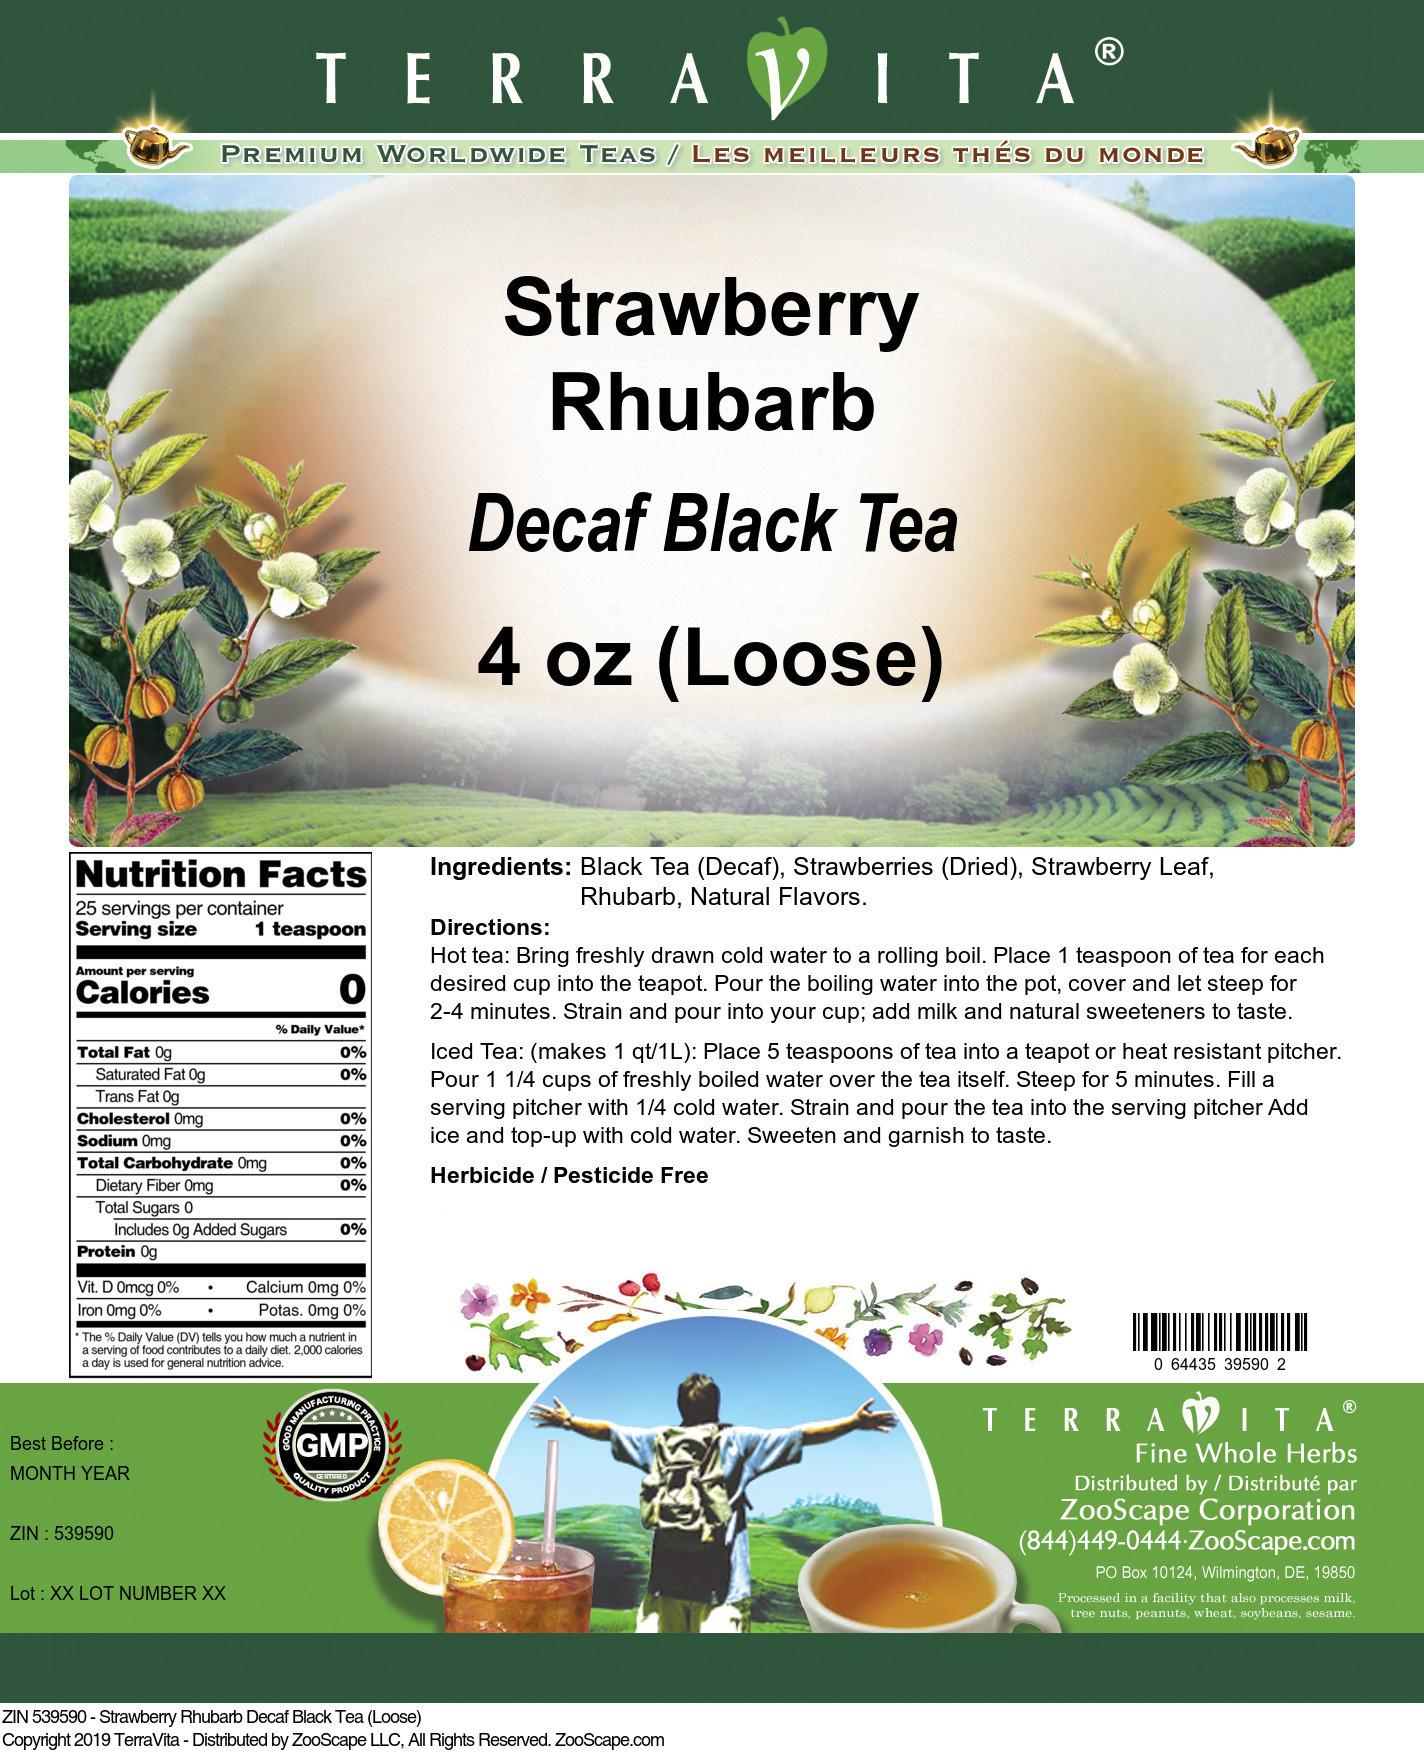 Strawberry Rhubarb Decaf Black Tea (Loose)